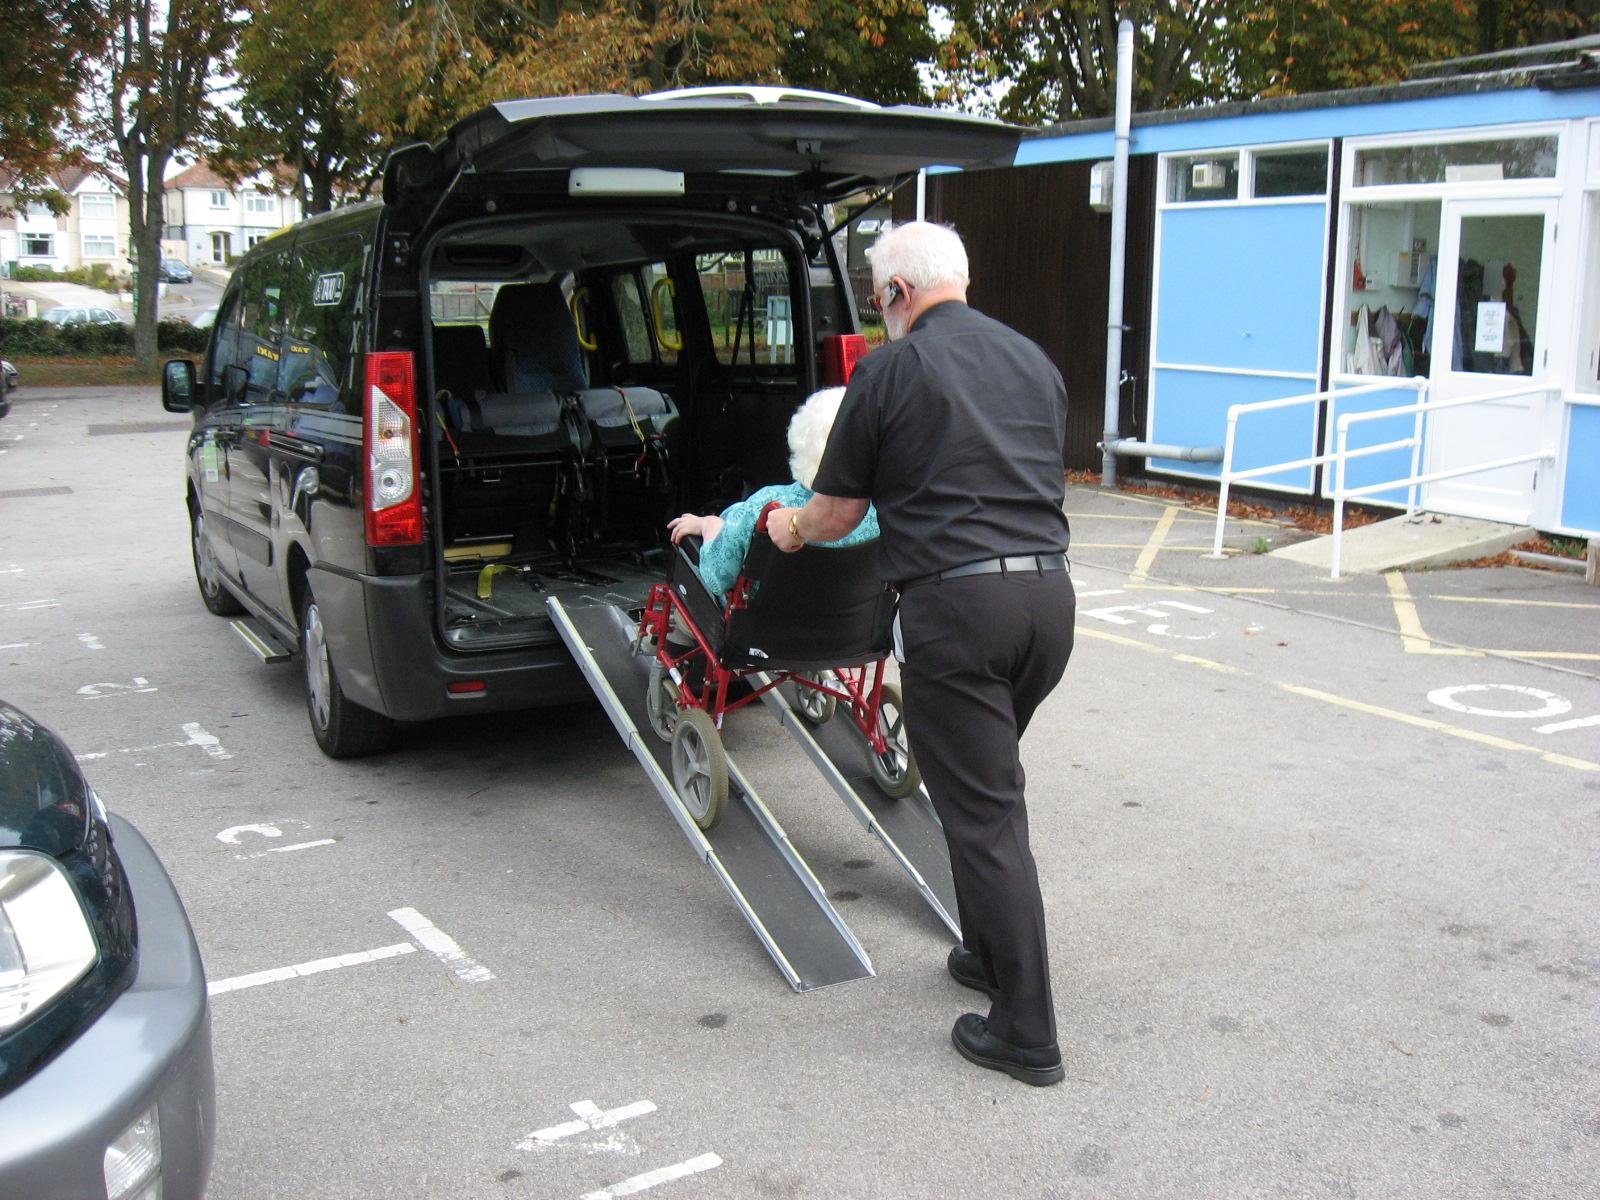 cig bins and wheelchair pics 025